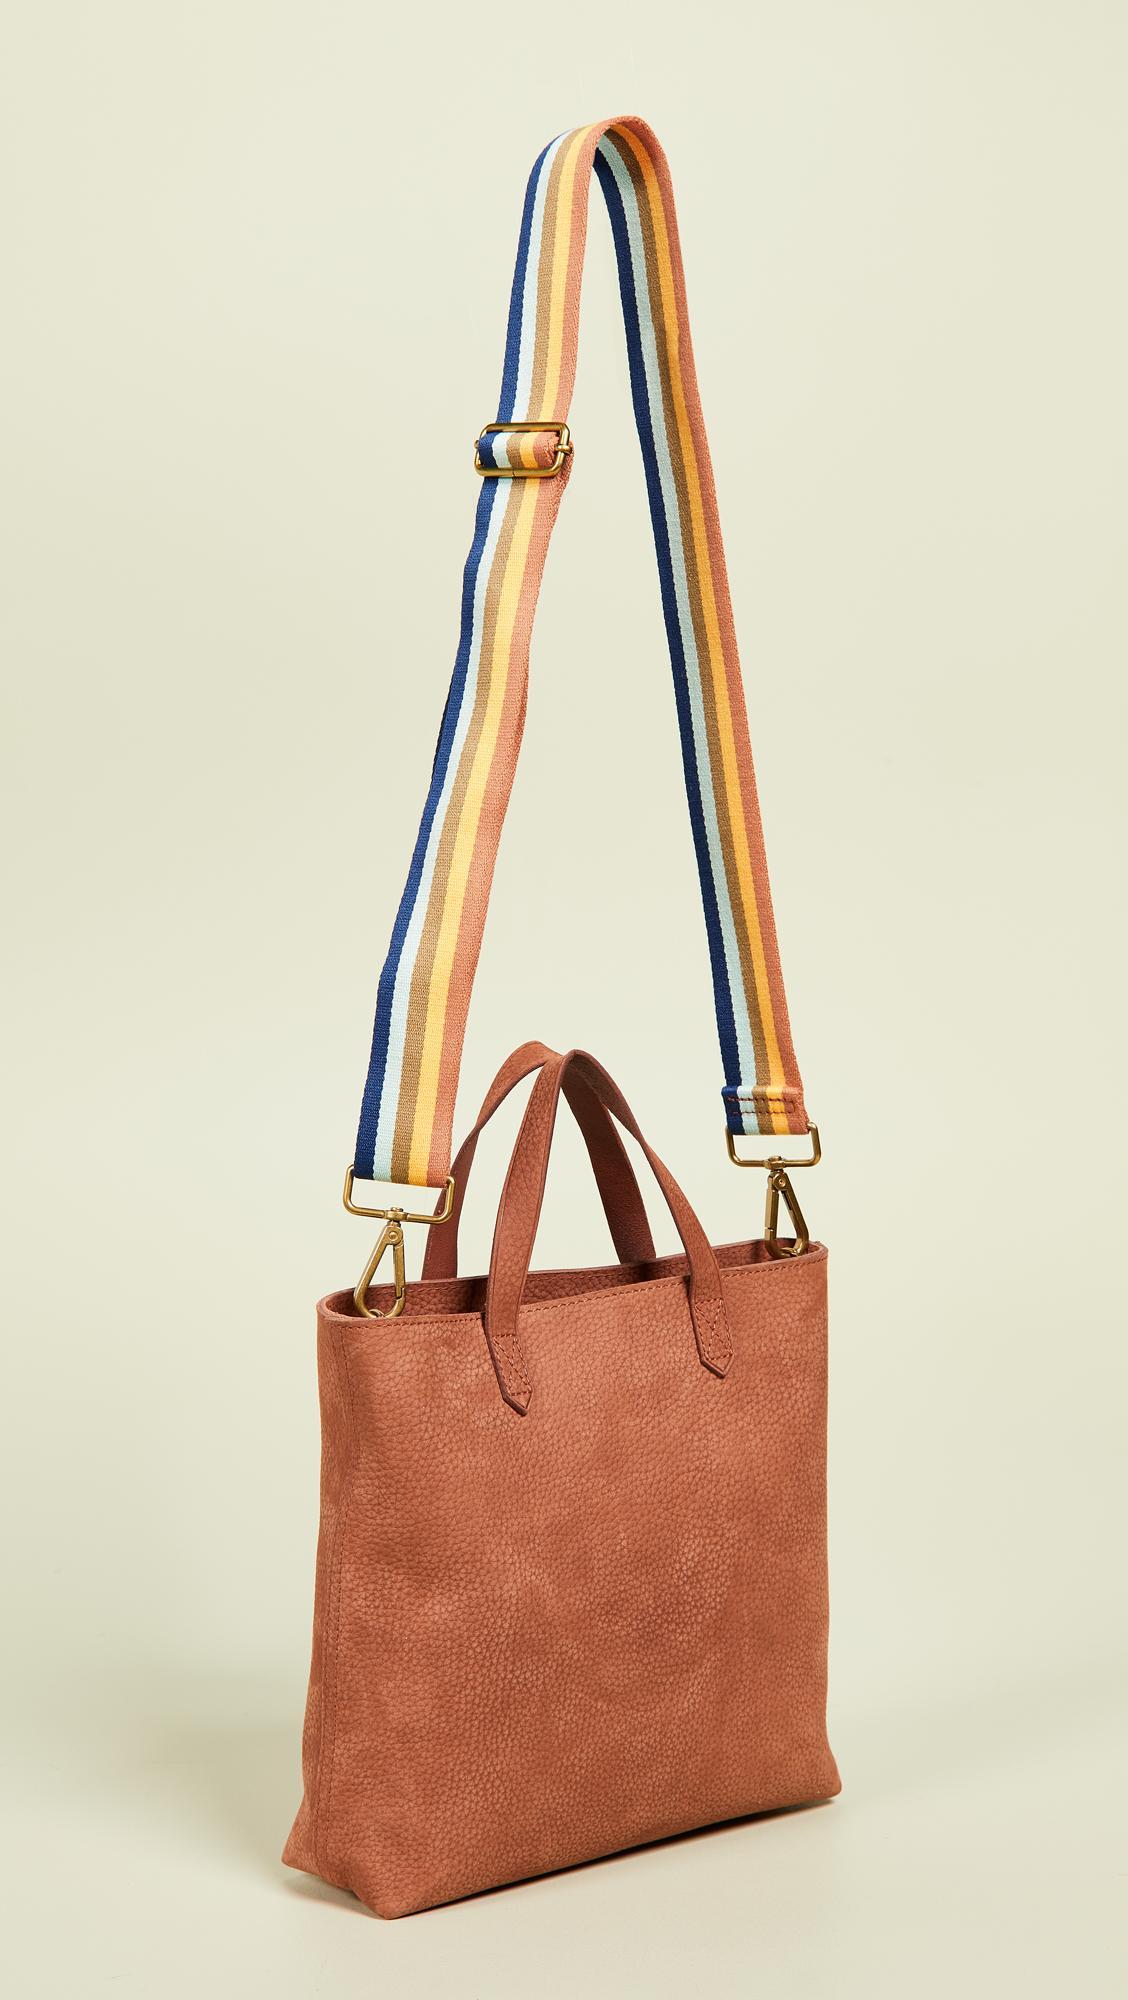 488708c70 Madewell The Zip-top Transport Crossbody In Nubuck Leather: Rainbow ...